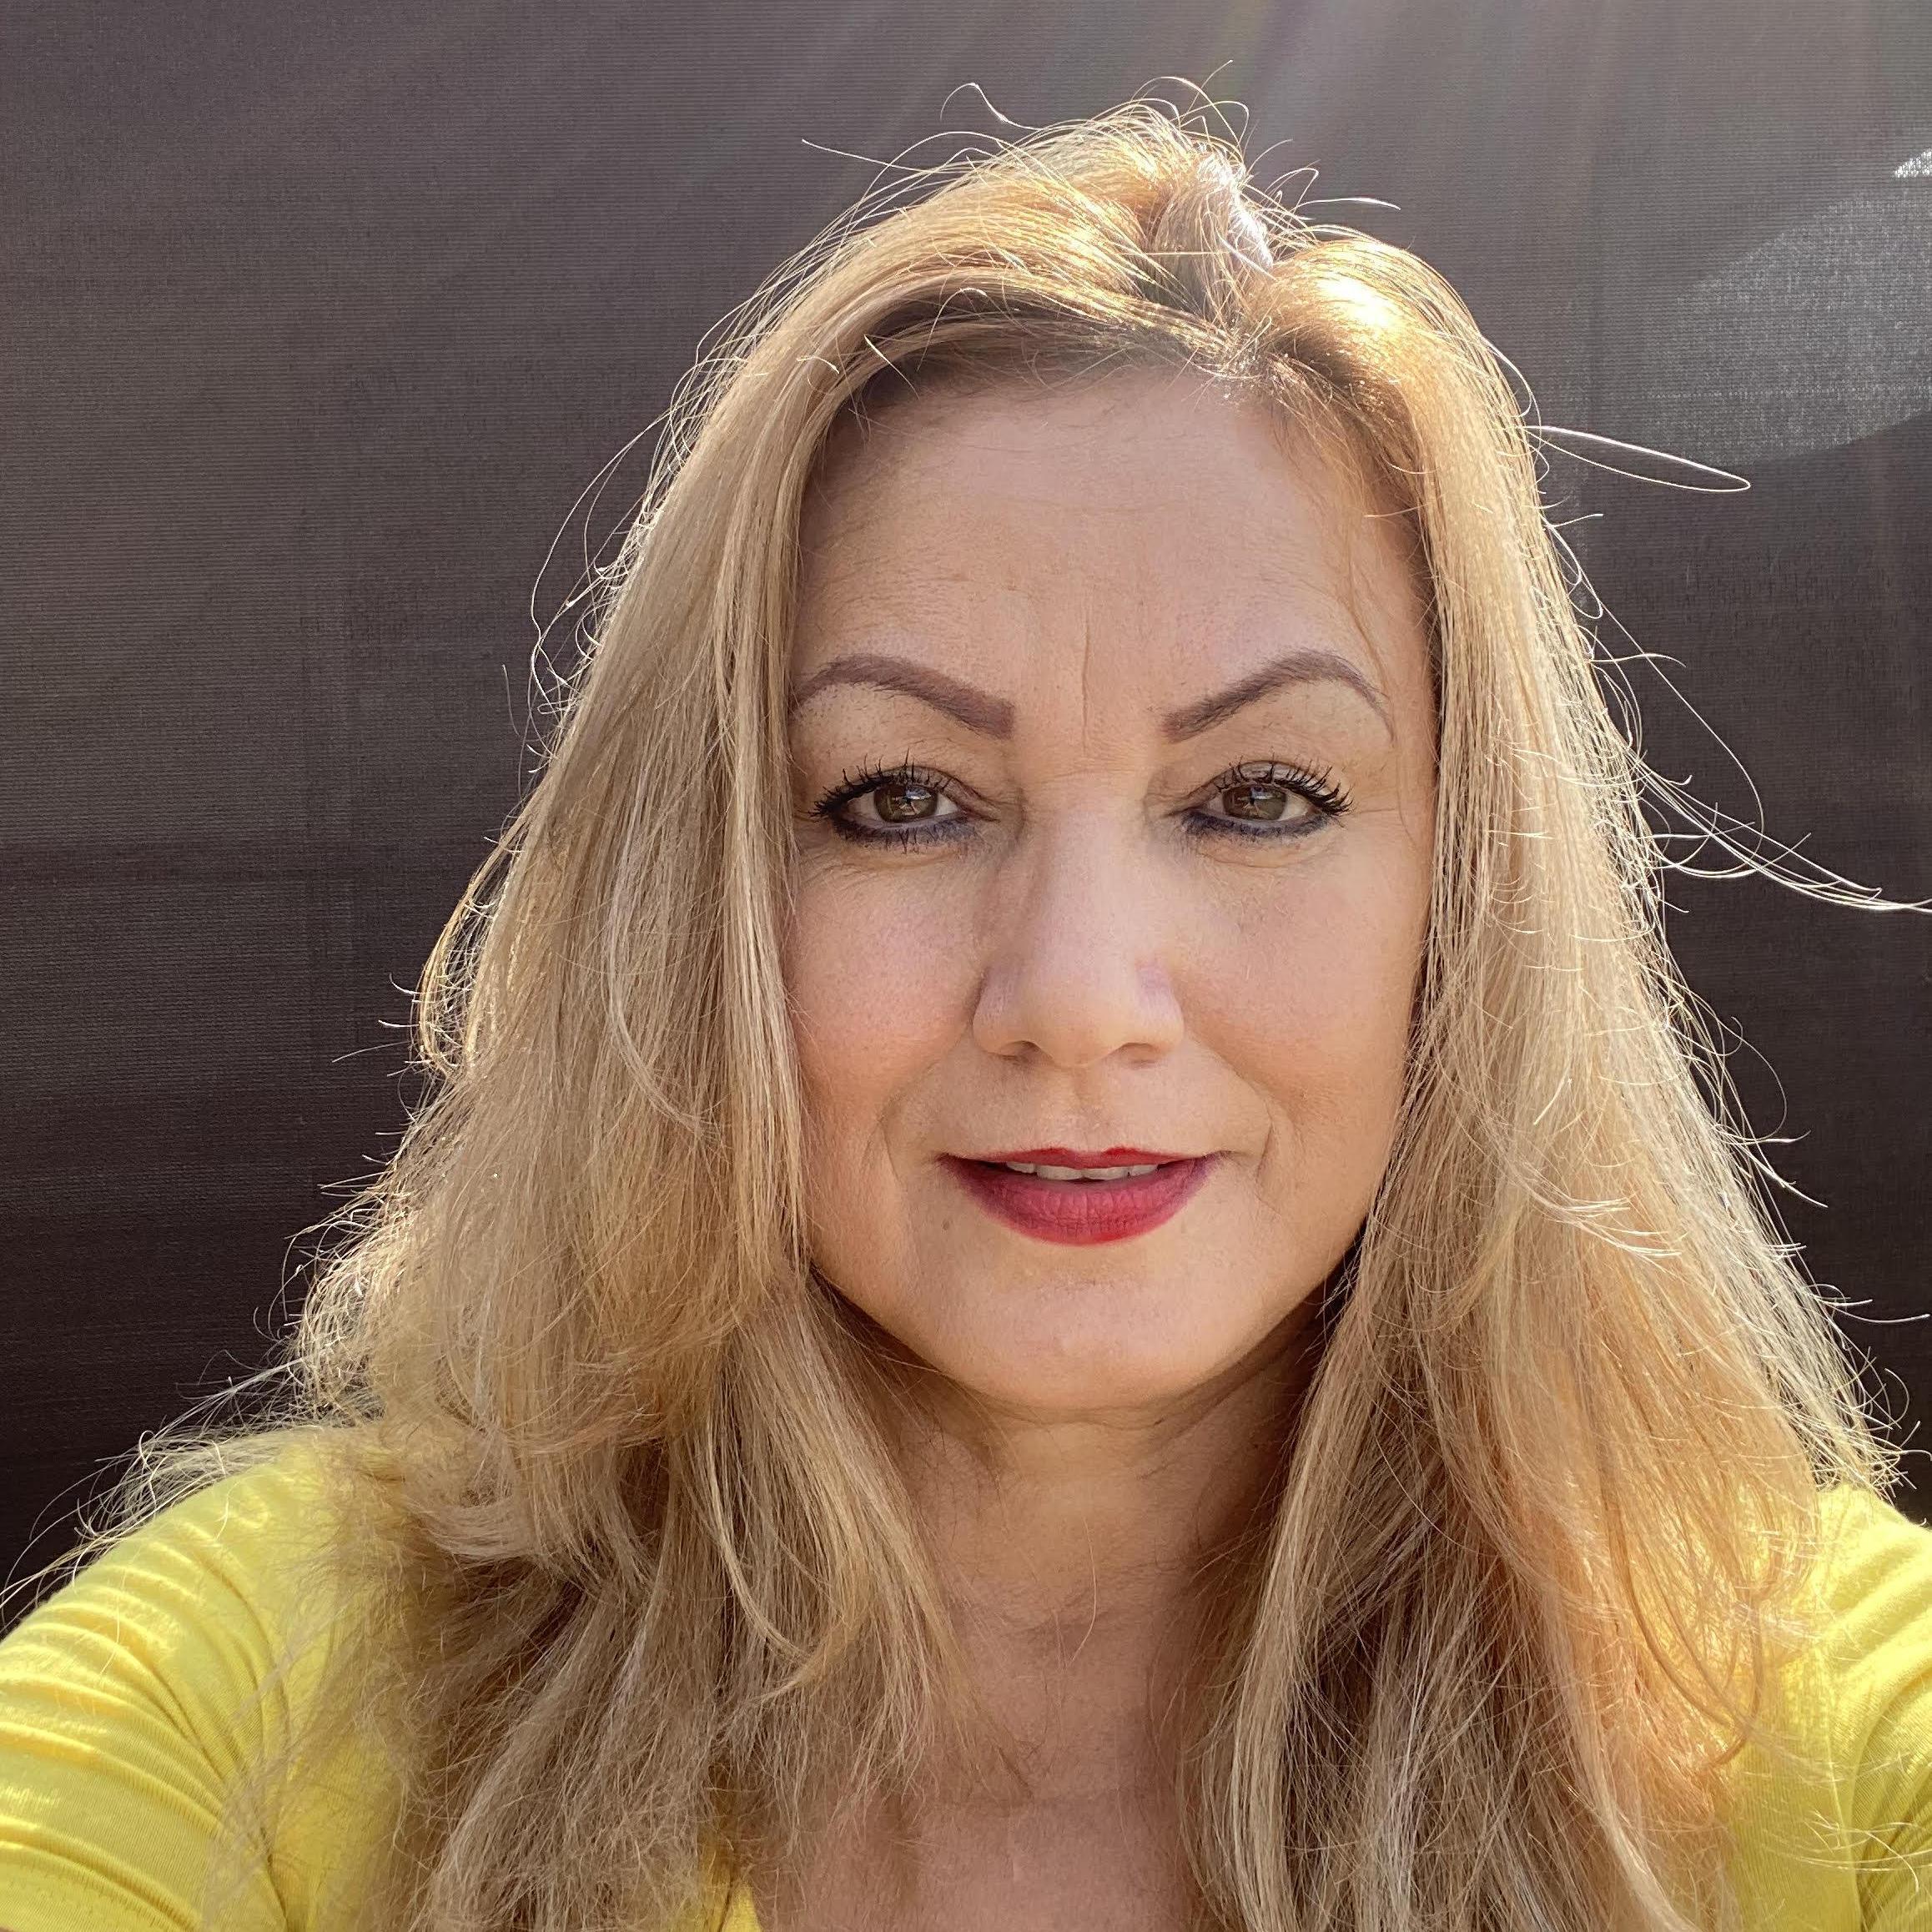 Idolina Herrera's Profile Photo